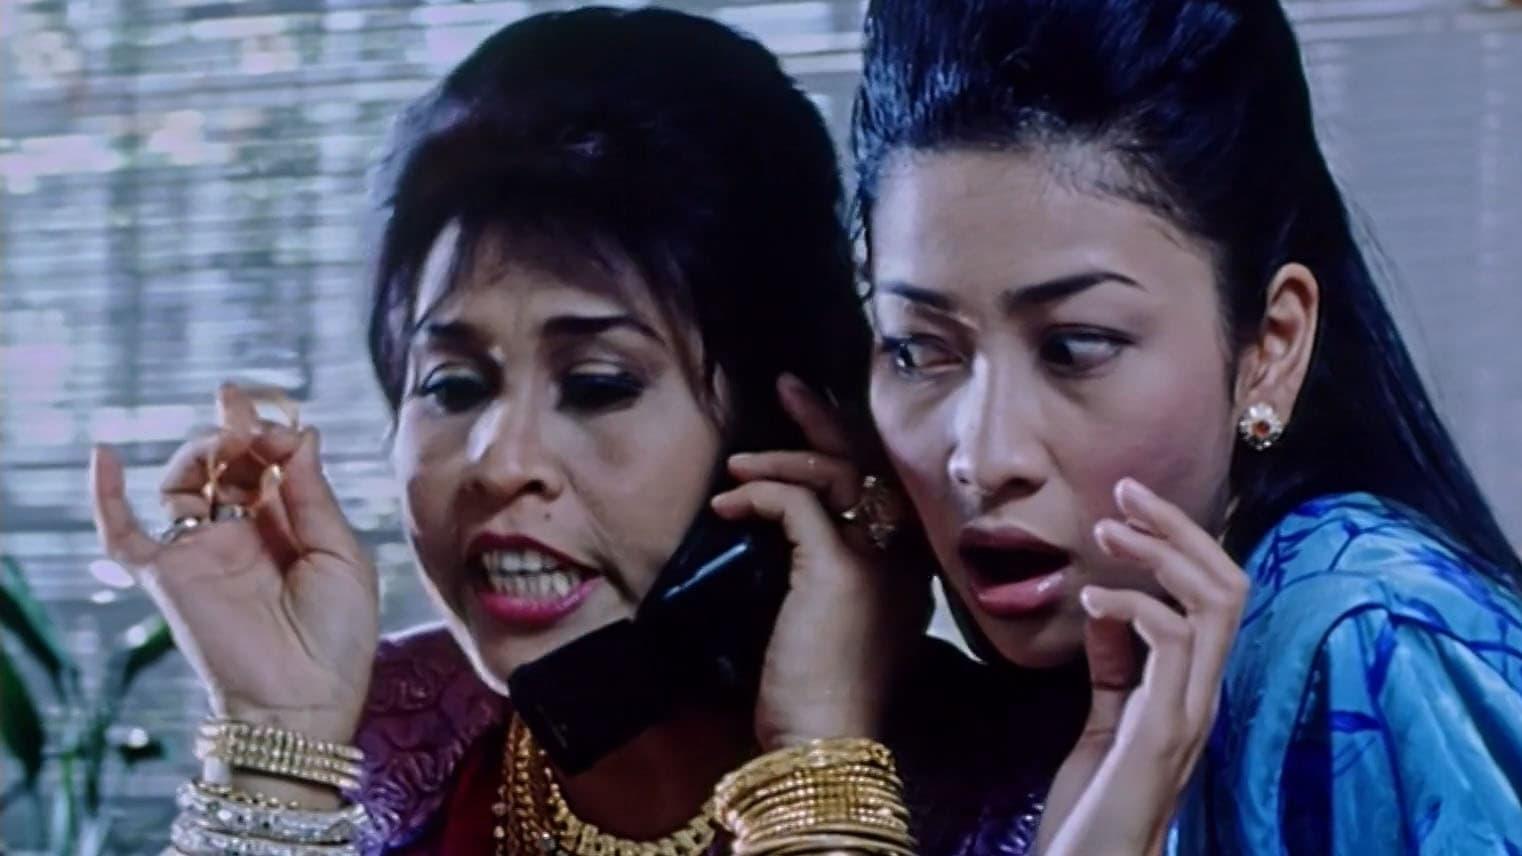 Mami Jarum (2002) - IMDb